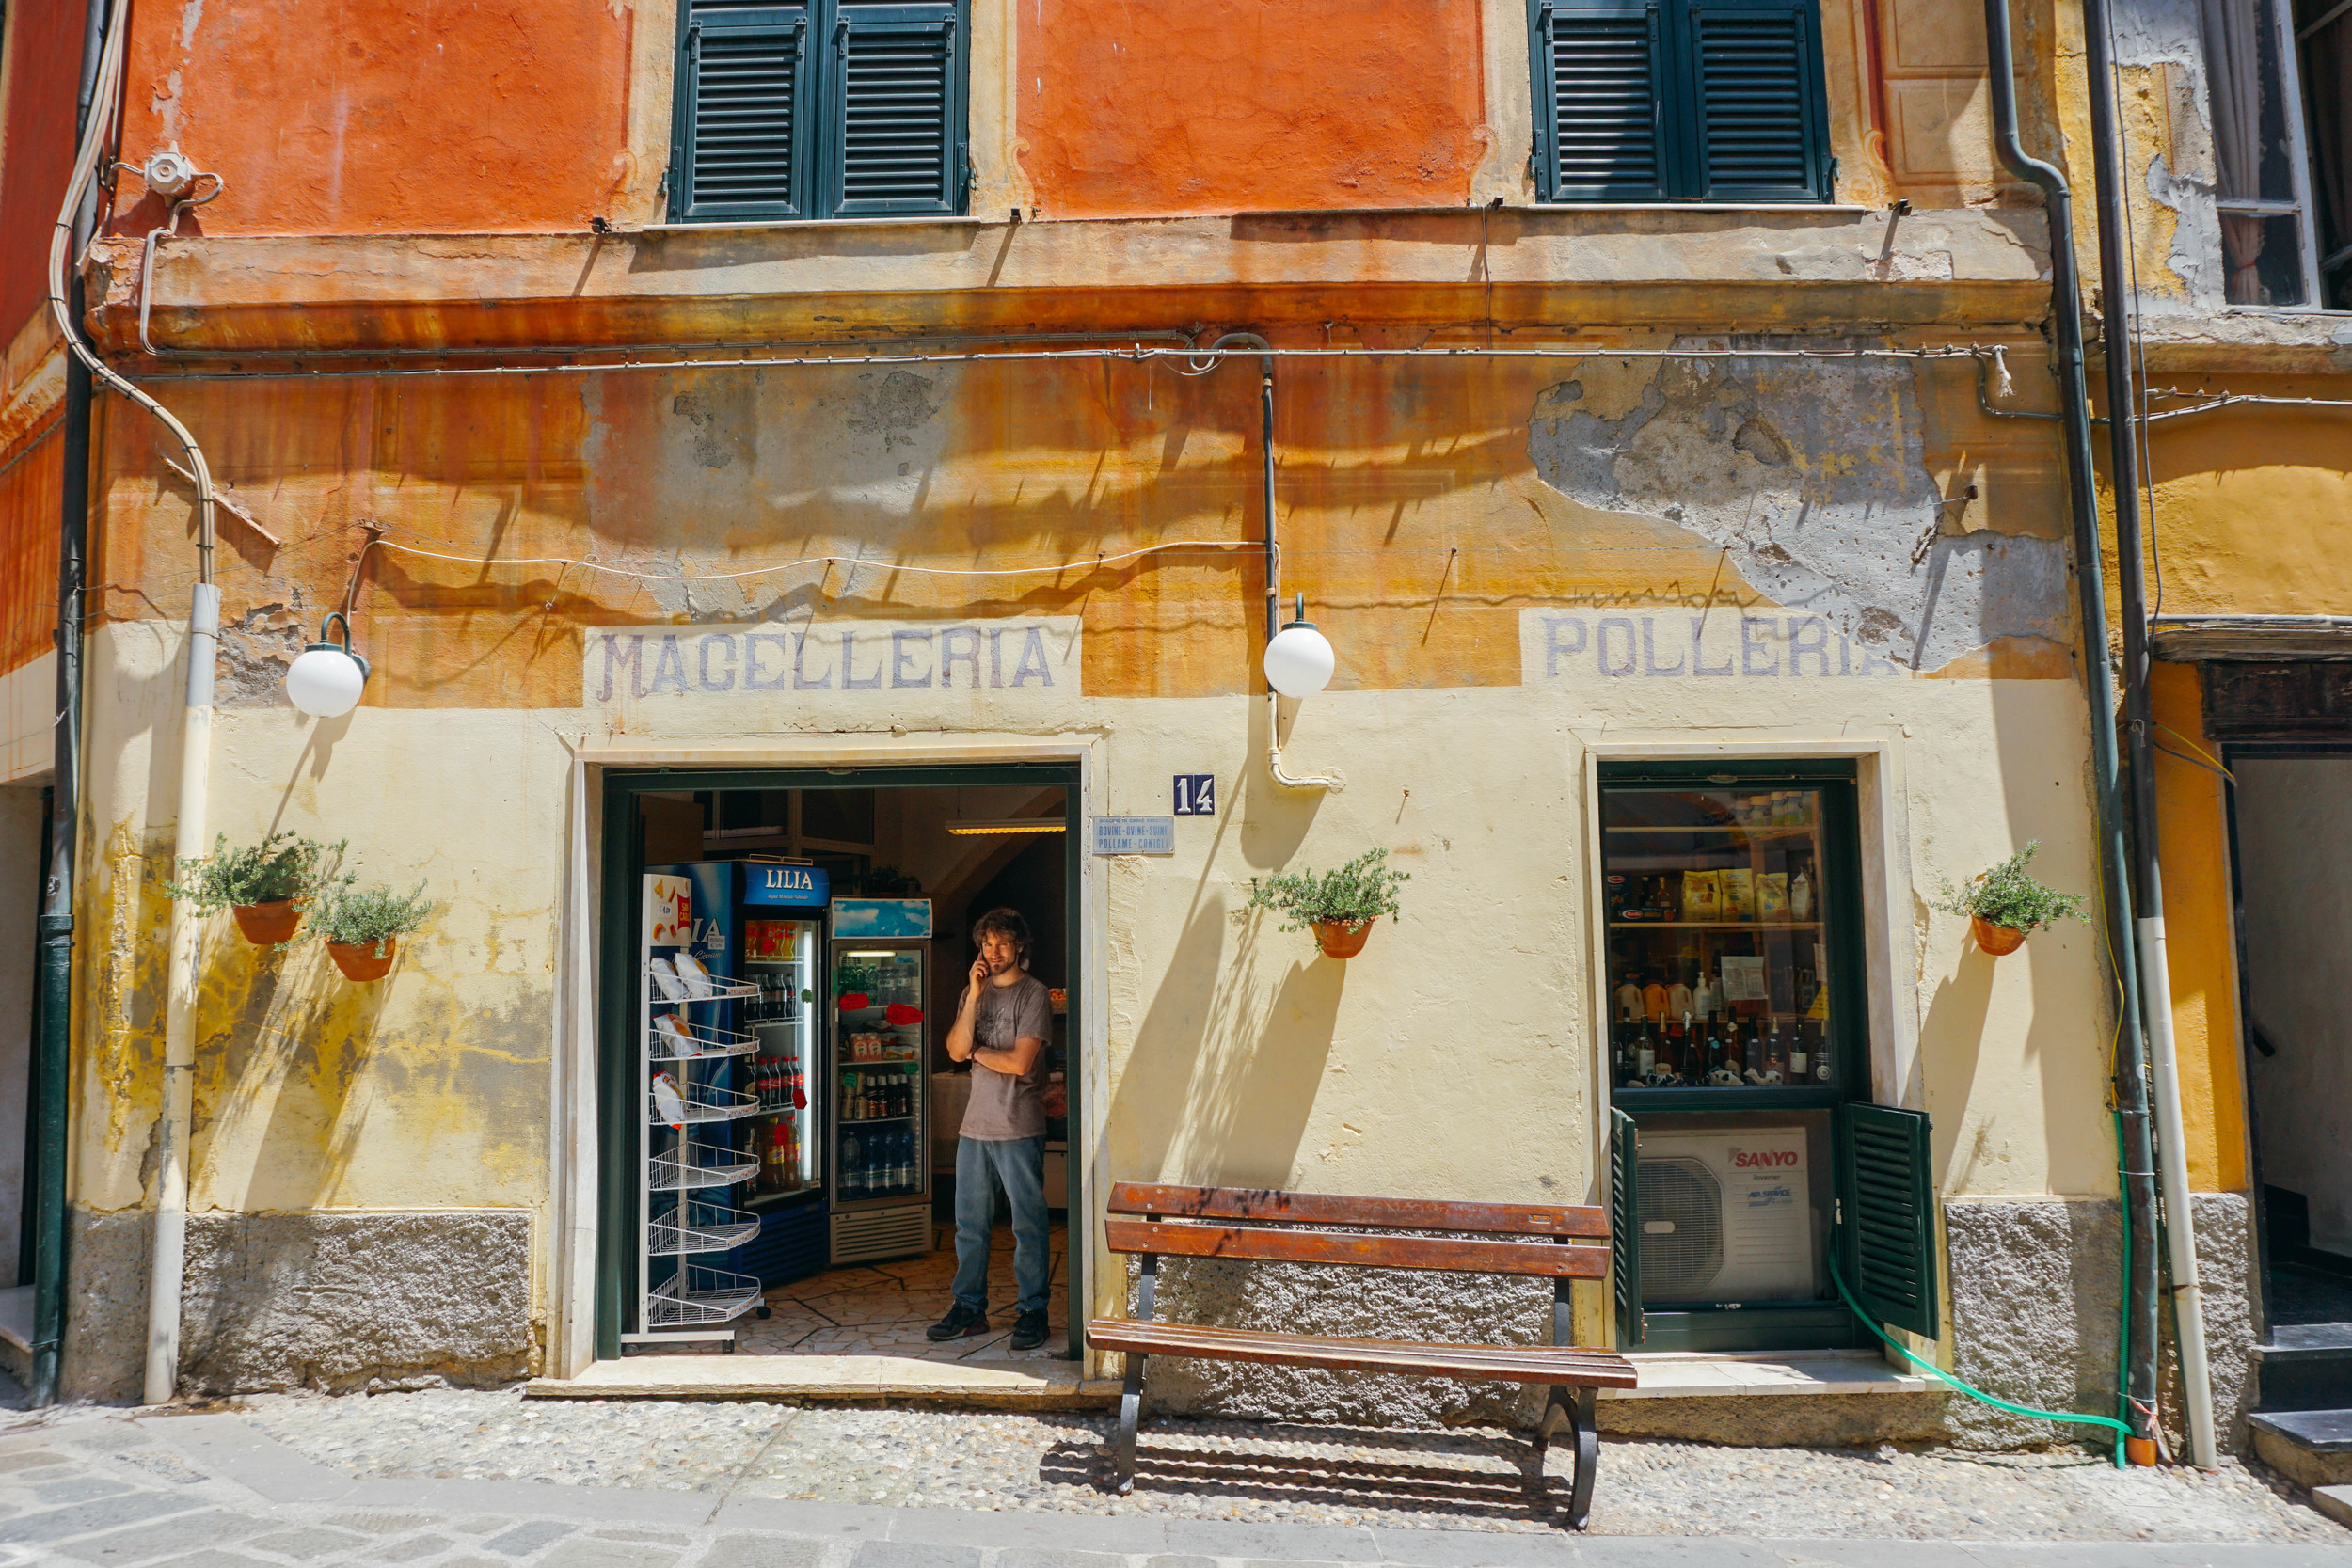 Things to do in Monterosso al Mare, Cinque Terre